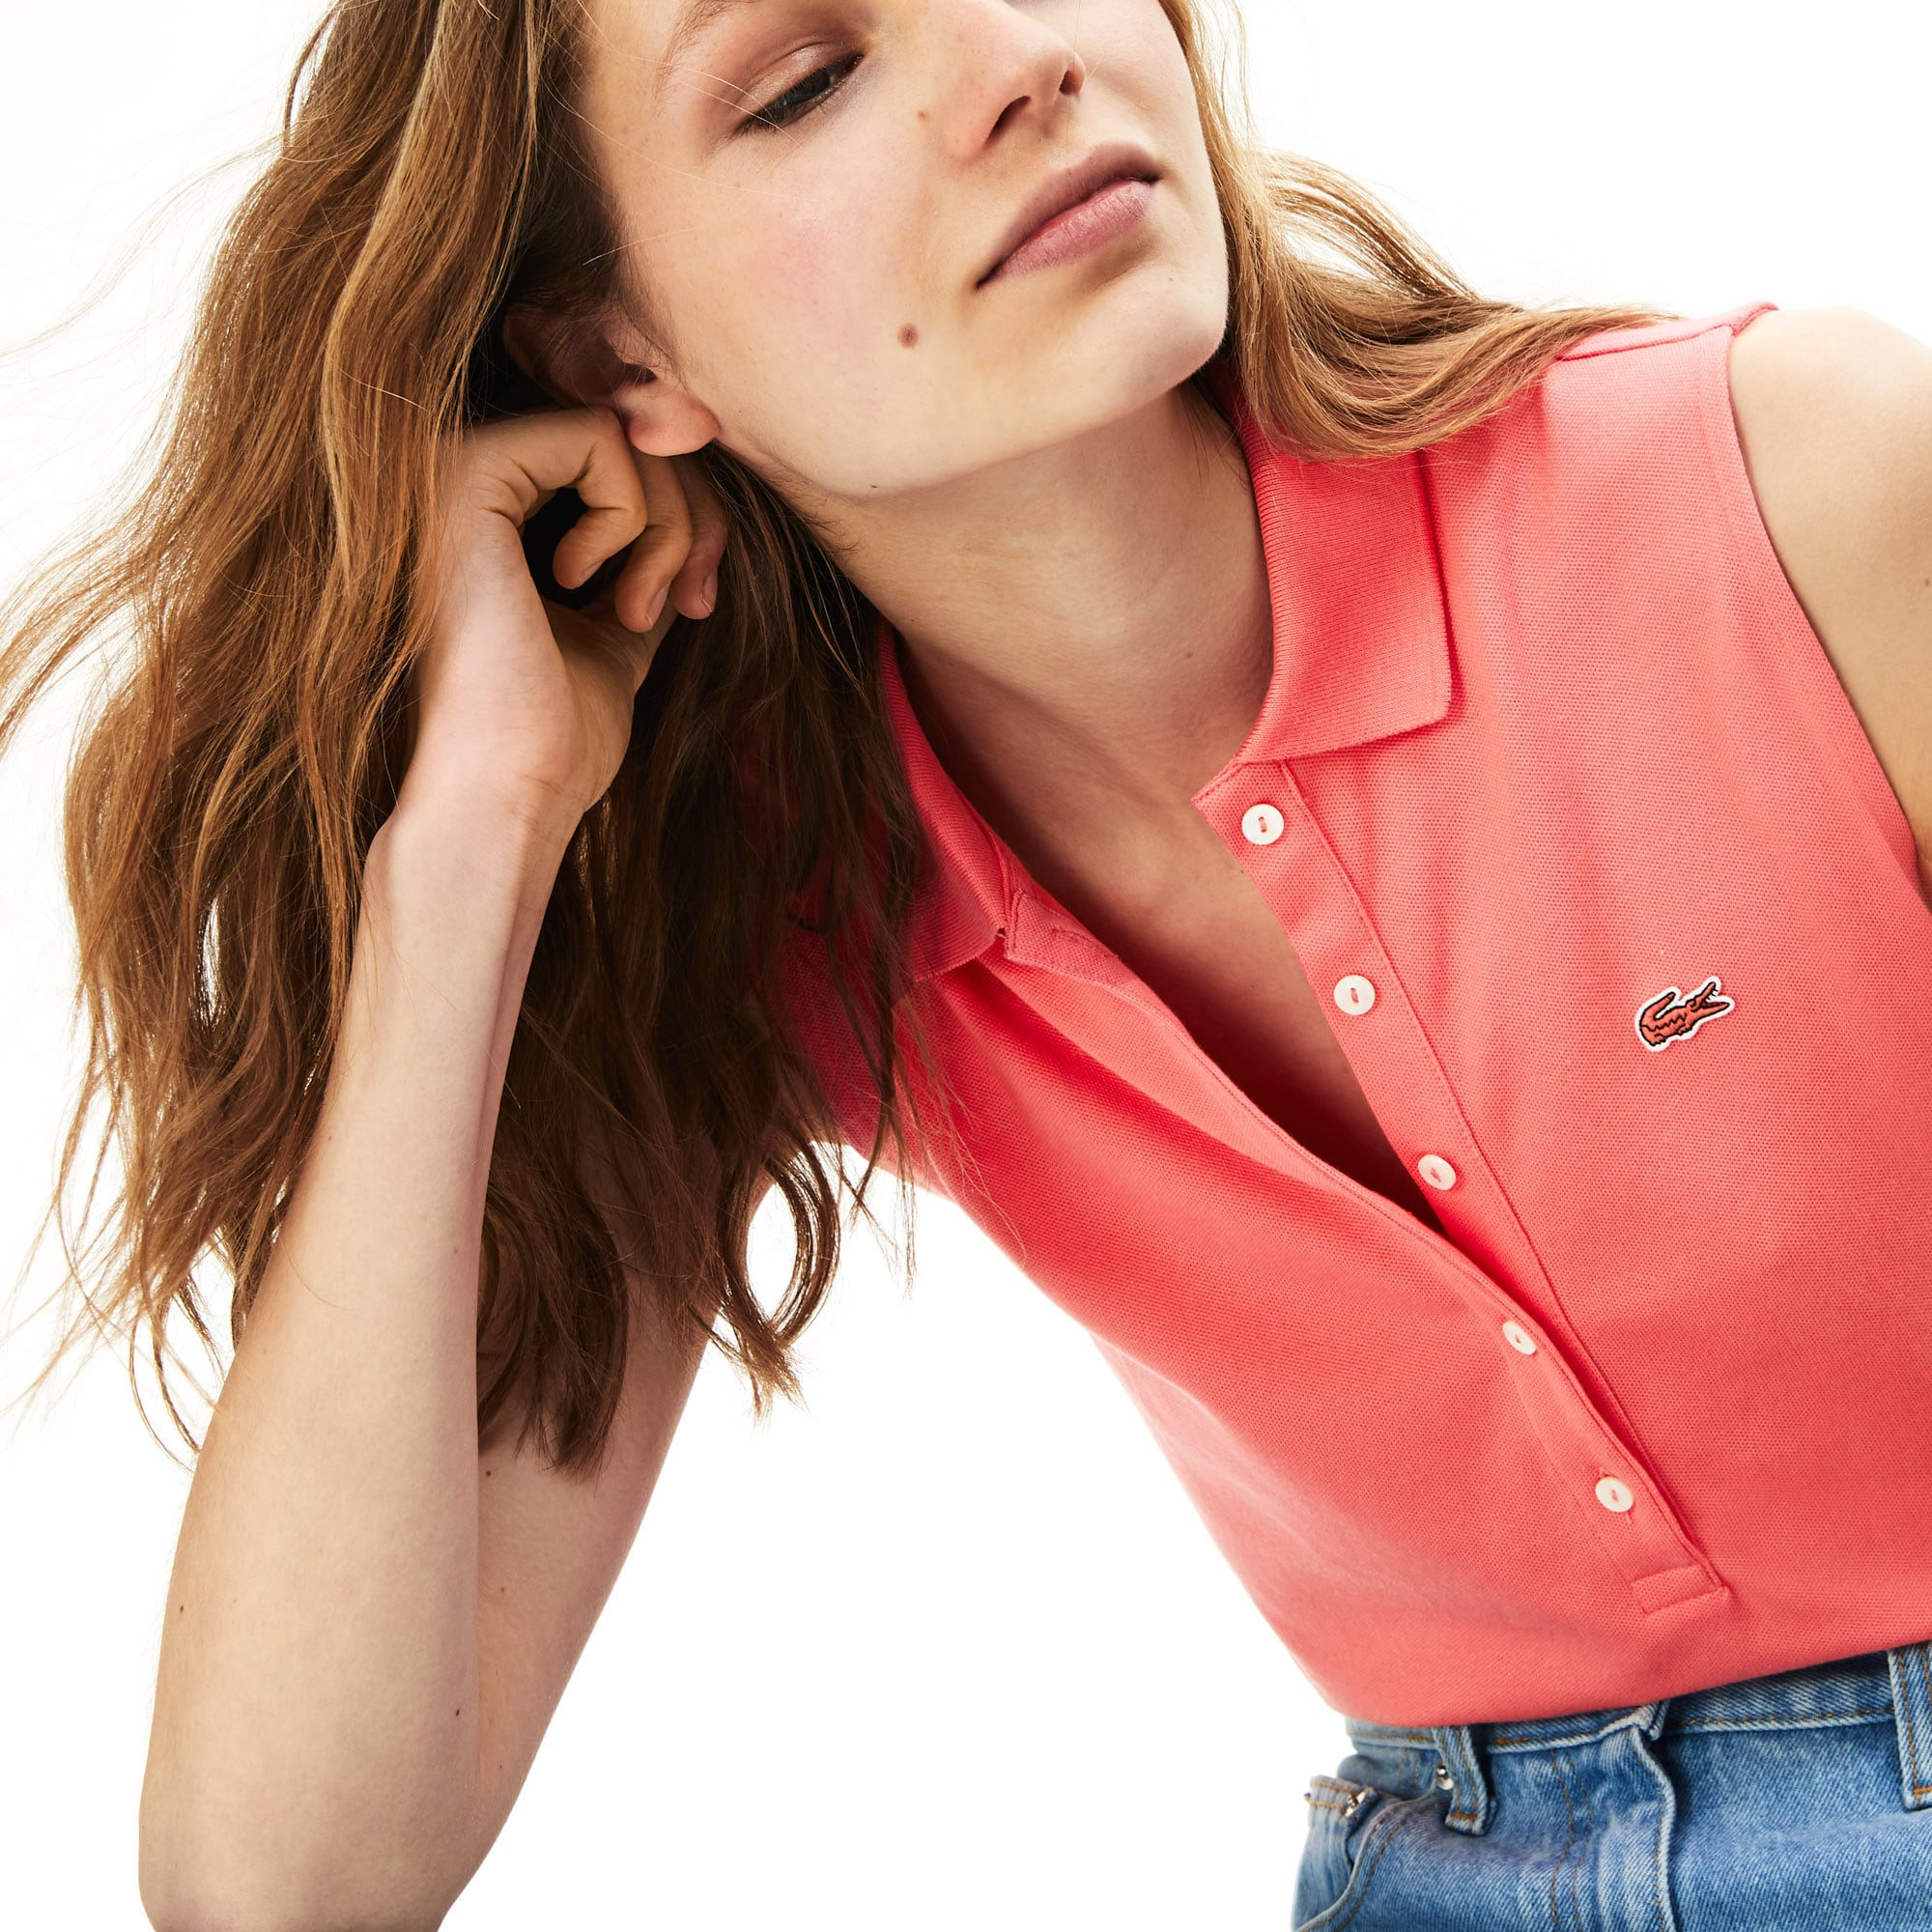 00982afb6741 Women s Slim Fit Stretch Mini Cotton Piqué Polo Shirt.  89.50. Pink · Black  · Navy Blue · White. + 3 colors